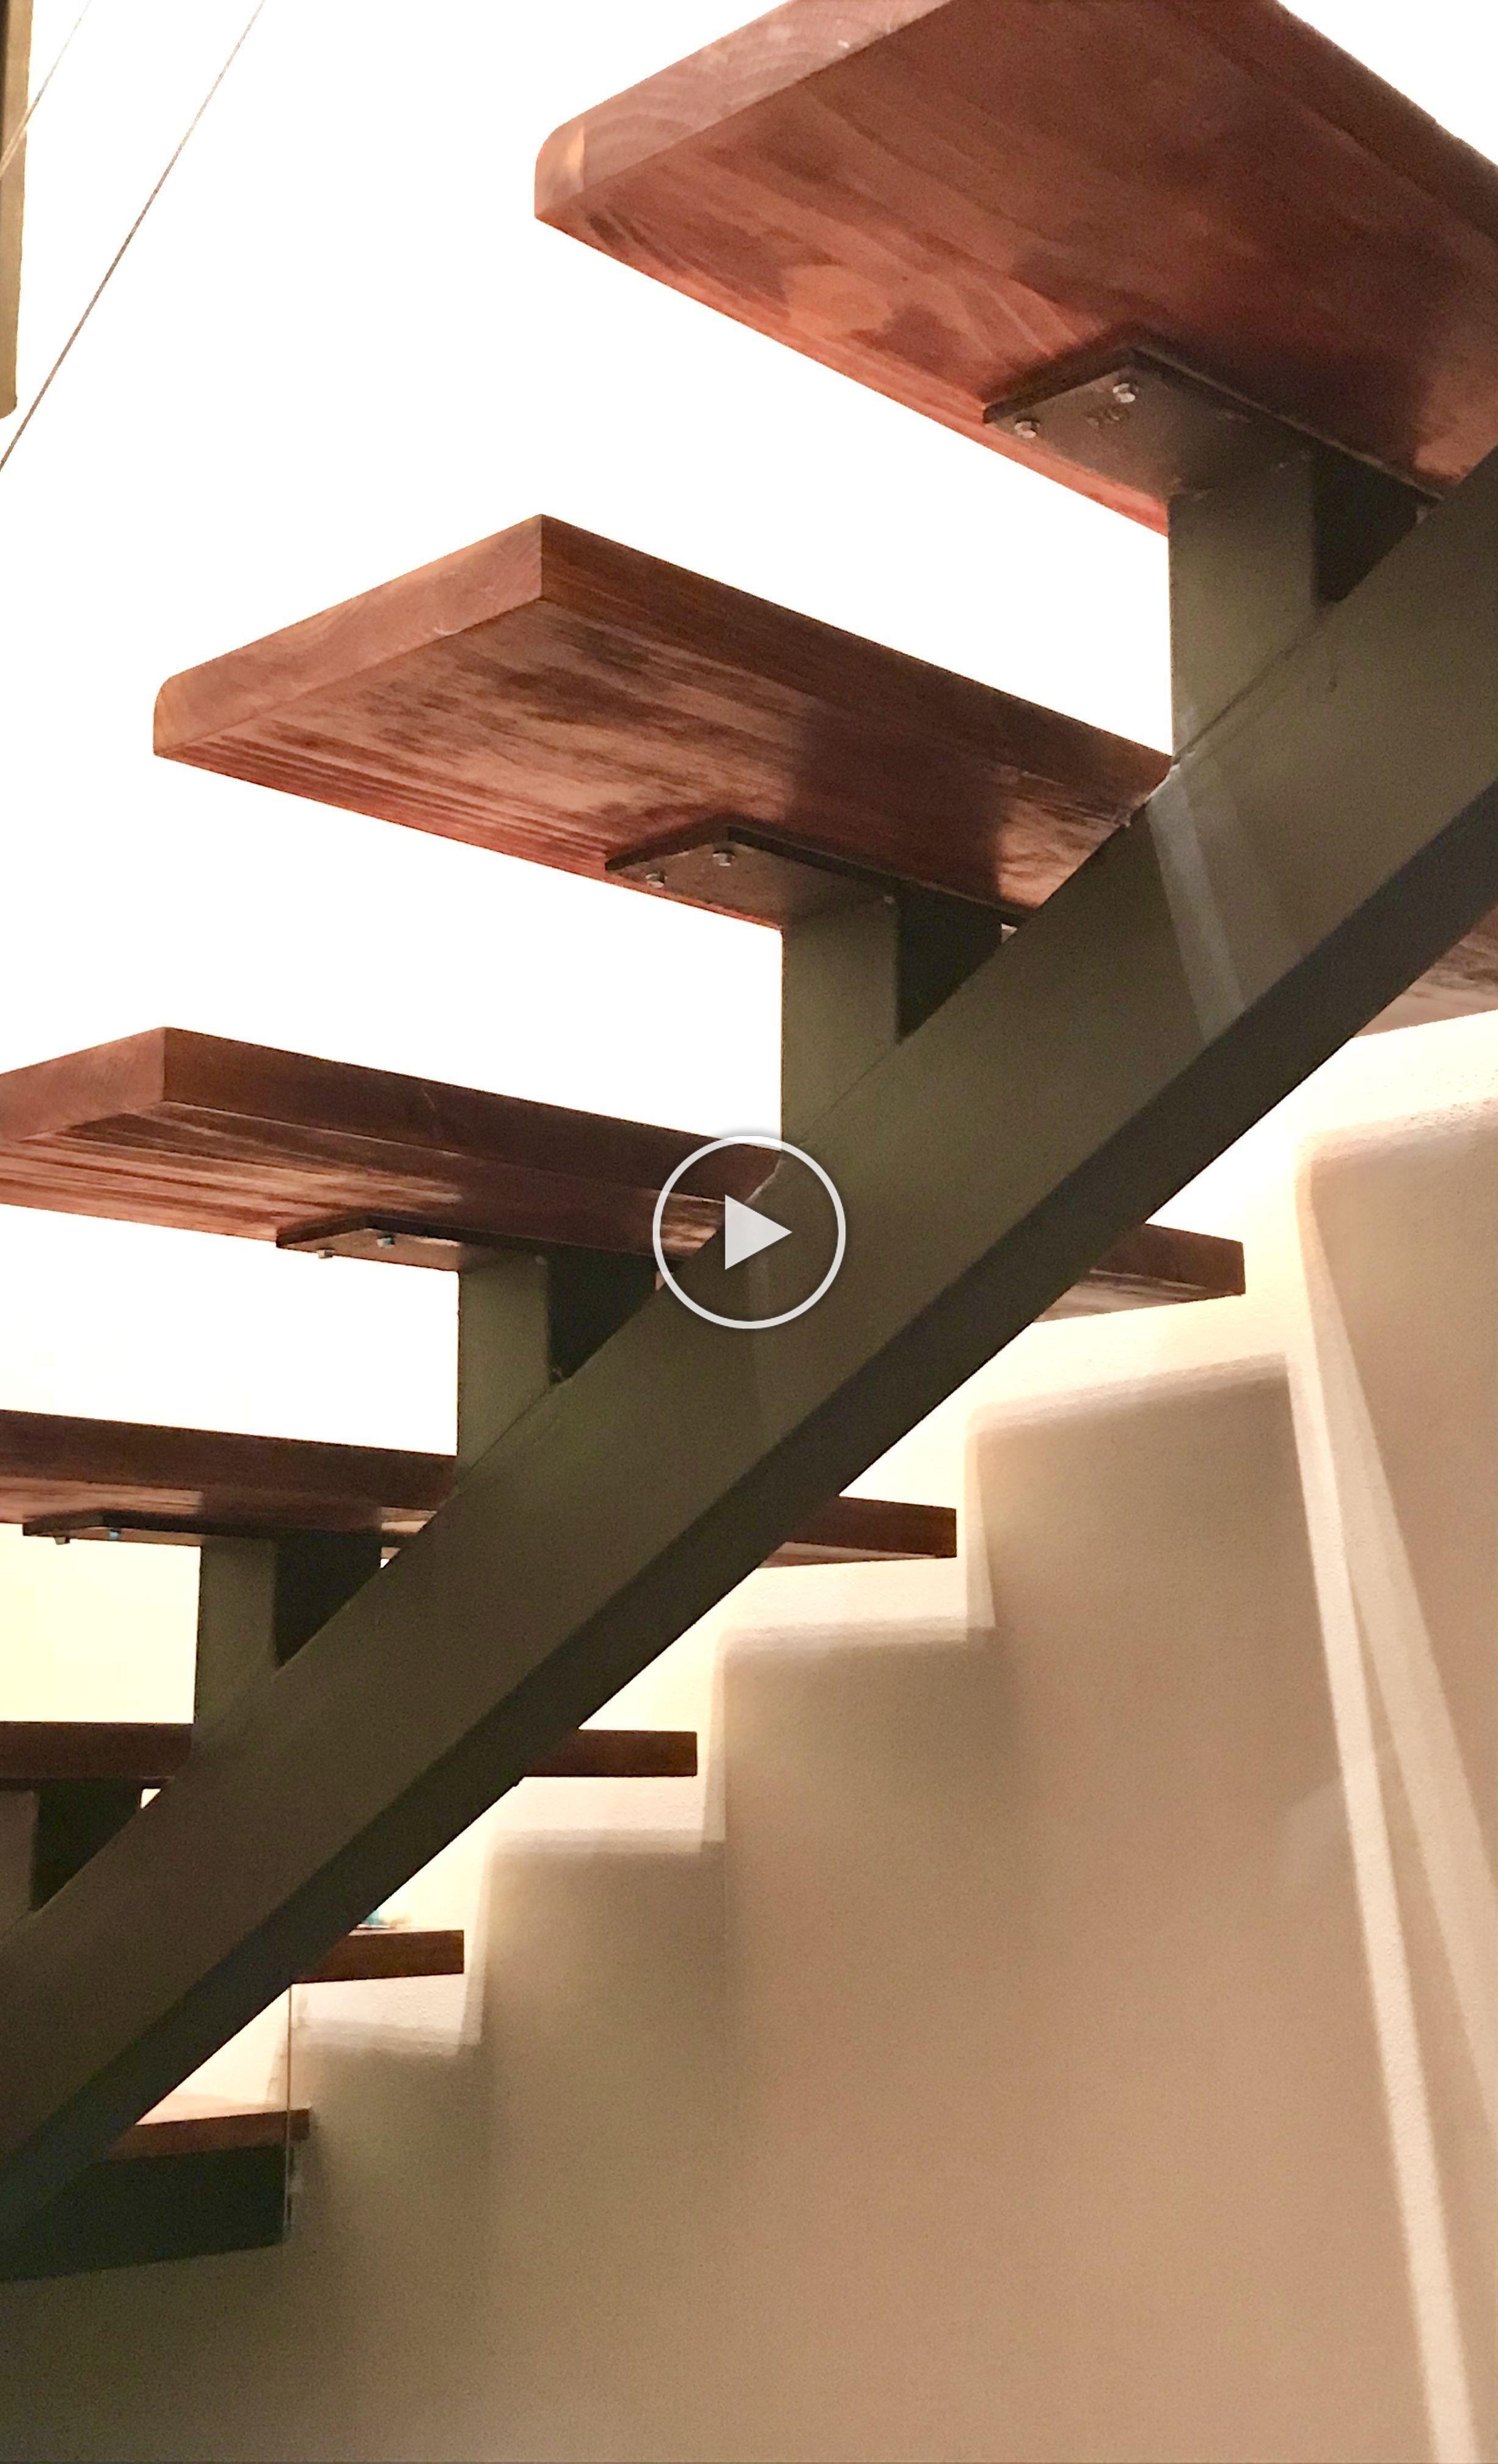 Best Detalle Escaleras 2020 Tasarım Evler Tasarım Merdivenler 400 x 300